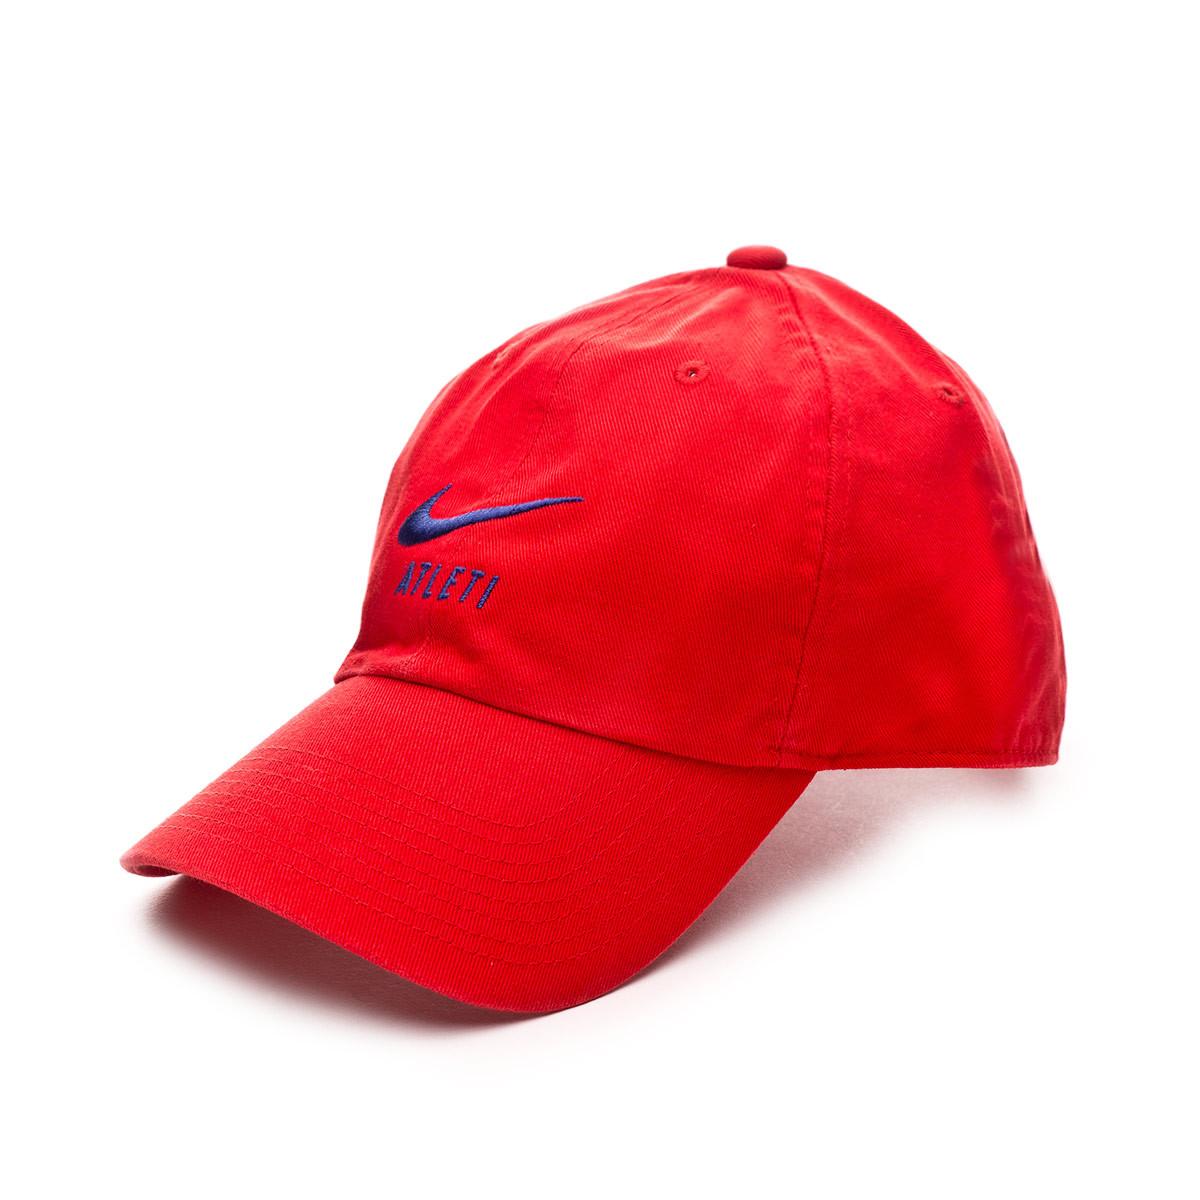 Cap Nike Atletico De Madrid Heritage86 2019 2020 Sport Red Deep Royal Blue Football Store Fútbol Emotion